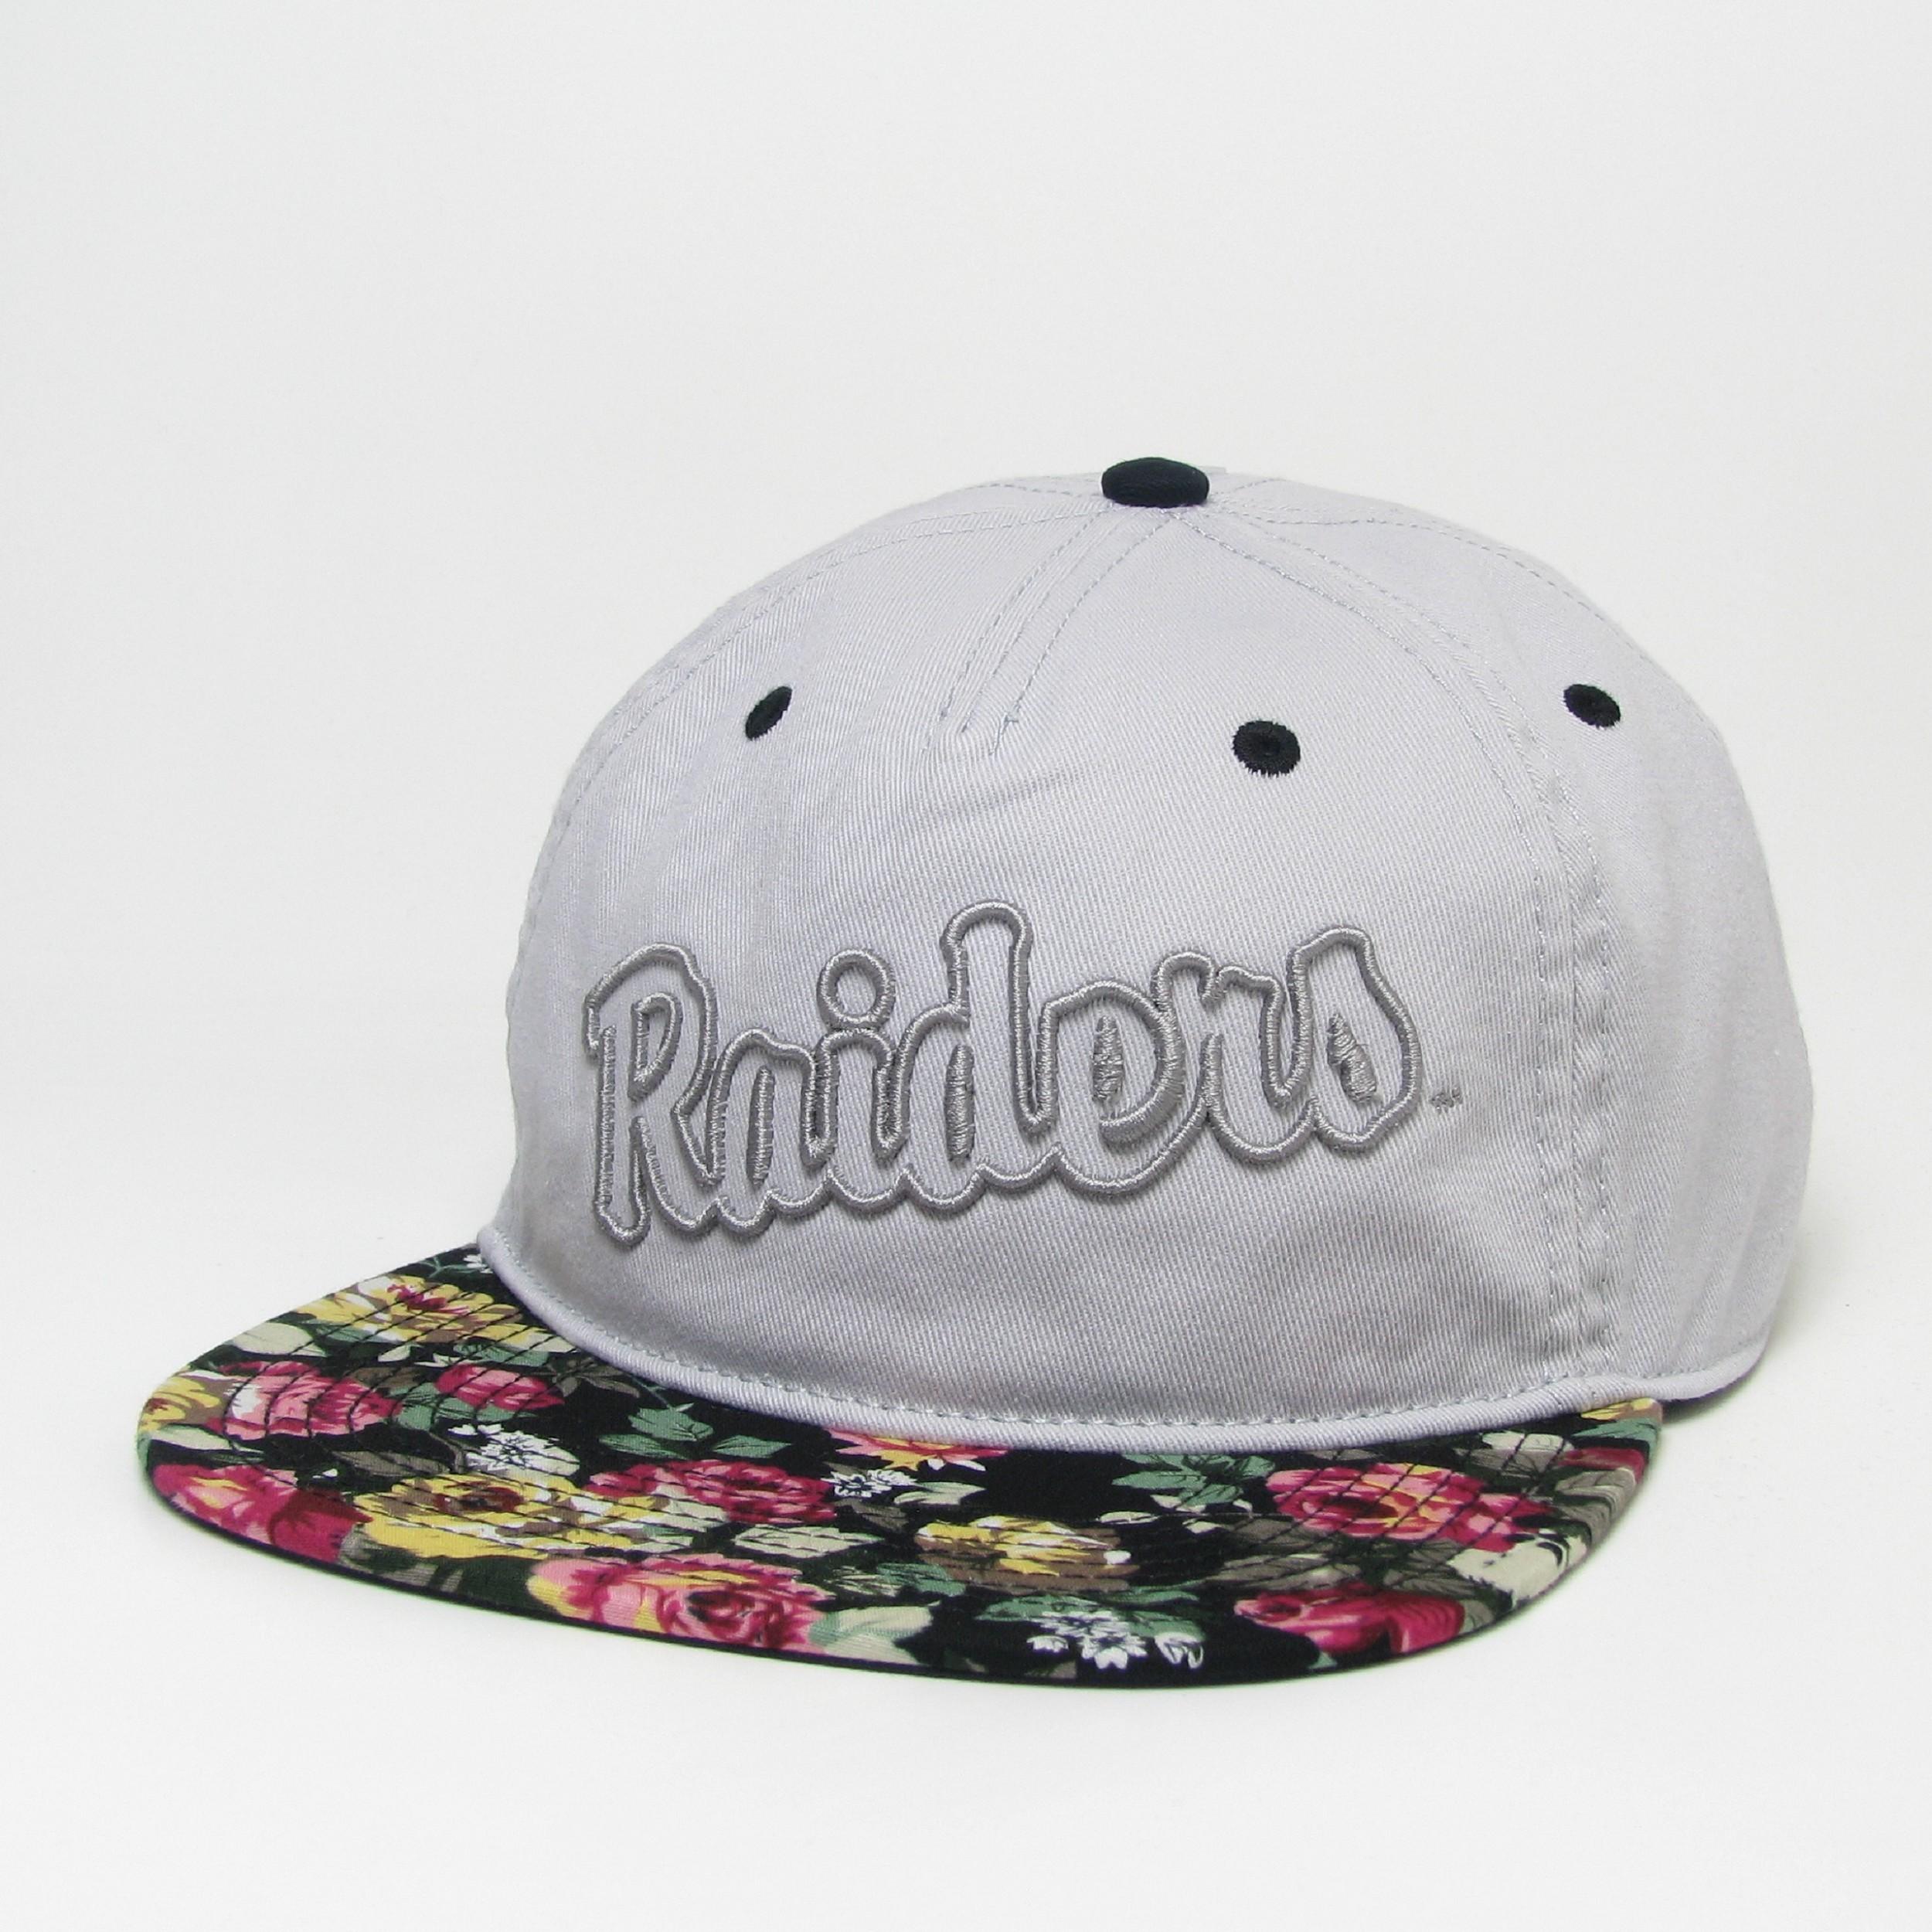 Raiders Axel 5-Panel Flat Brim Hat